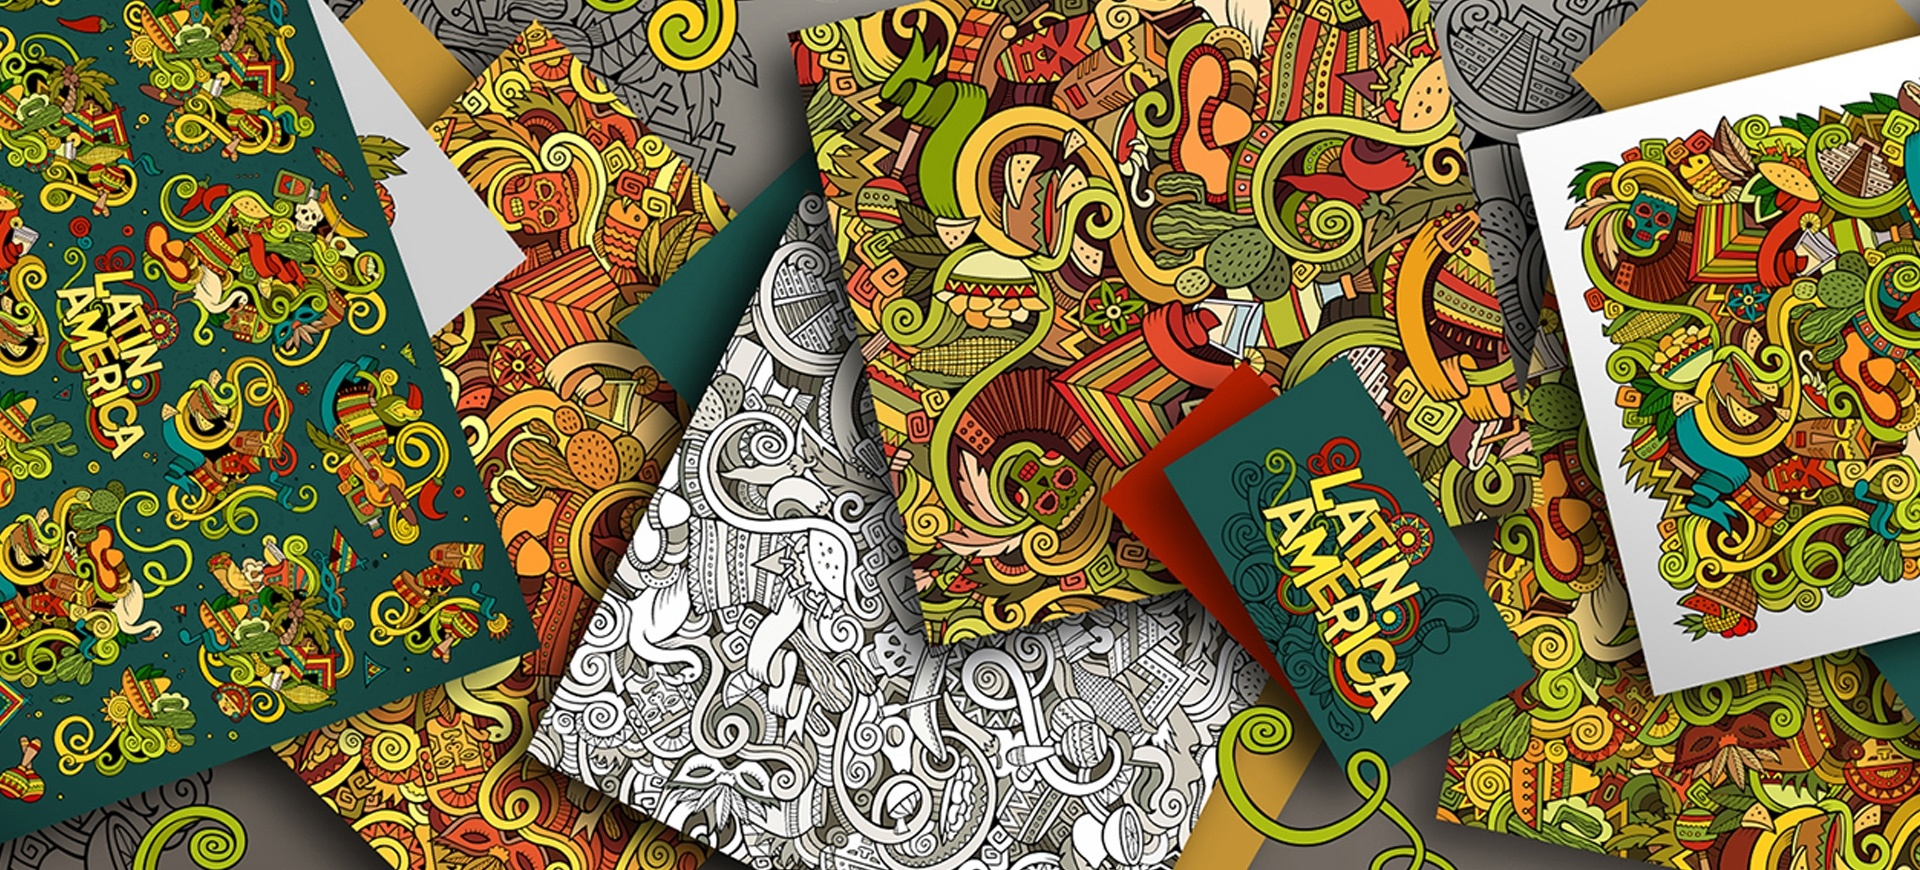 39+ Doodle Patterns & Backgrounds | Free & Premium Templates - Free Printable Doodle Patterns